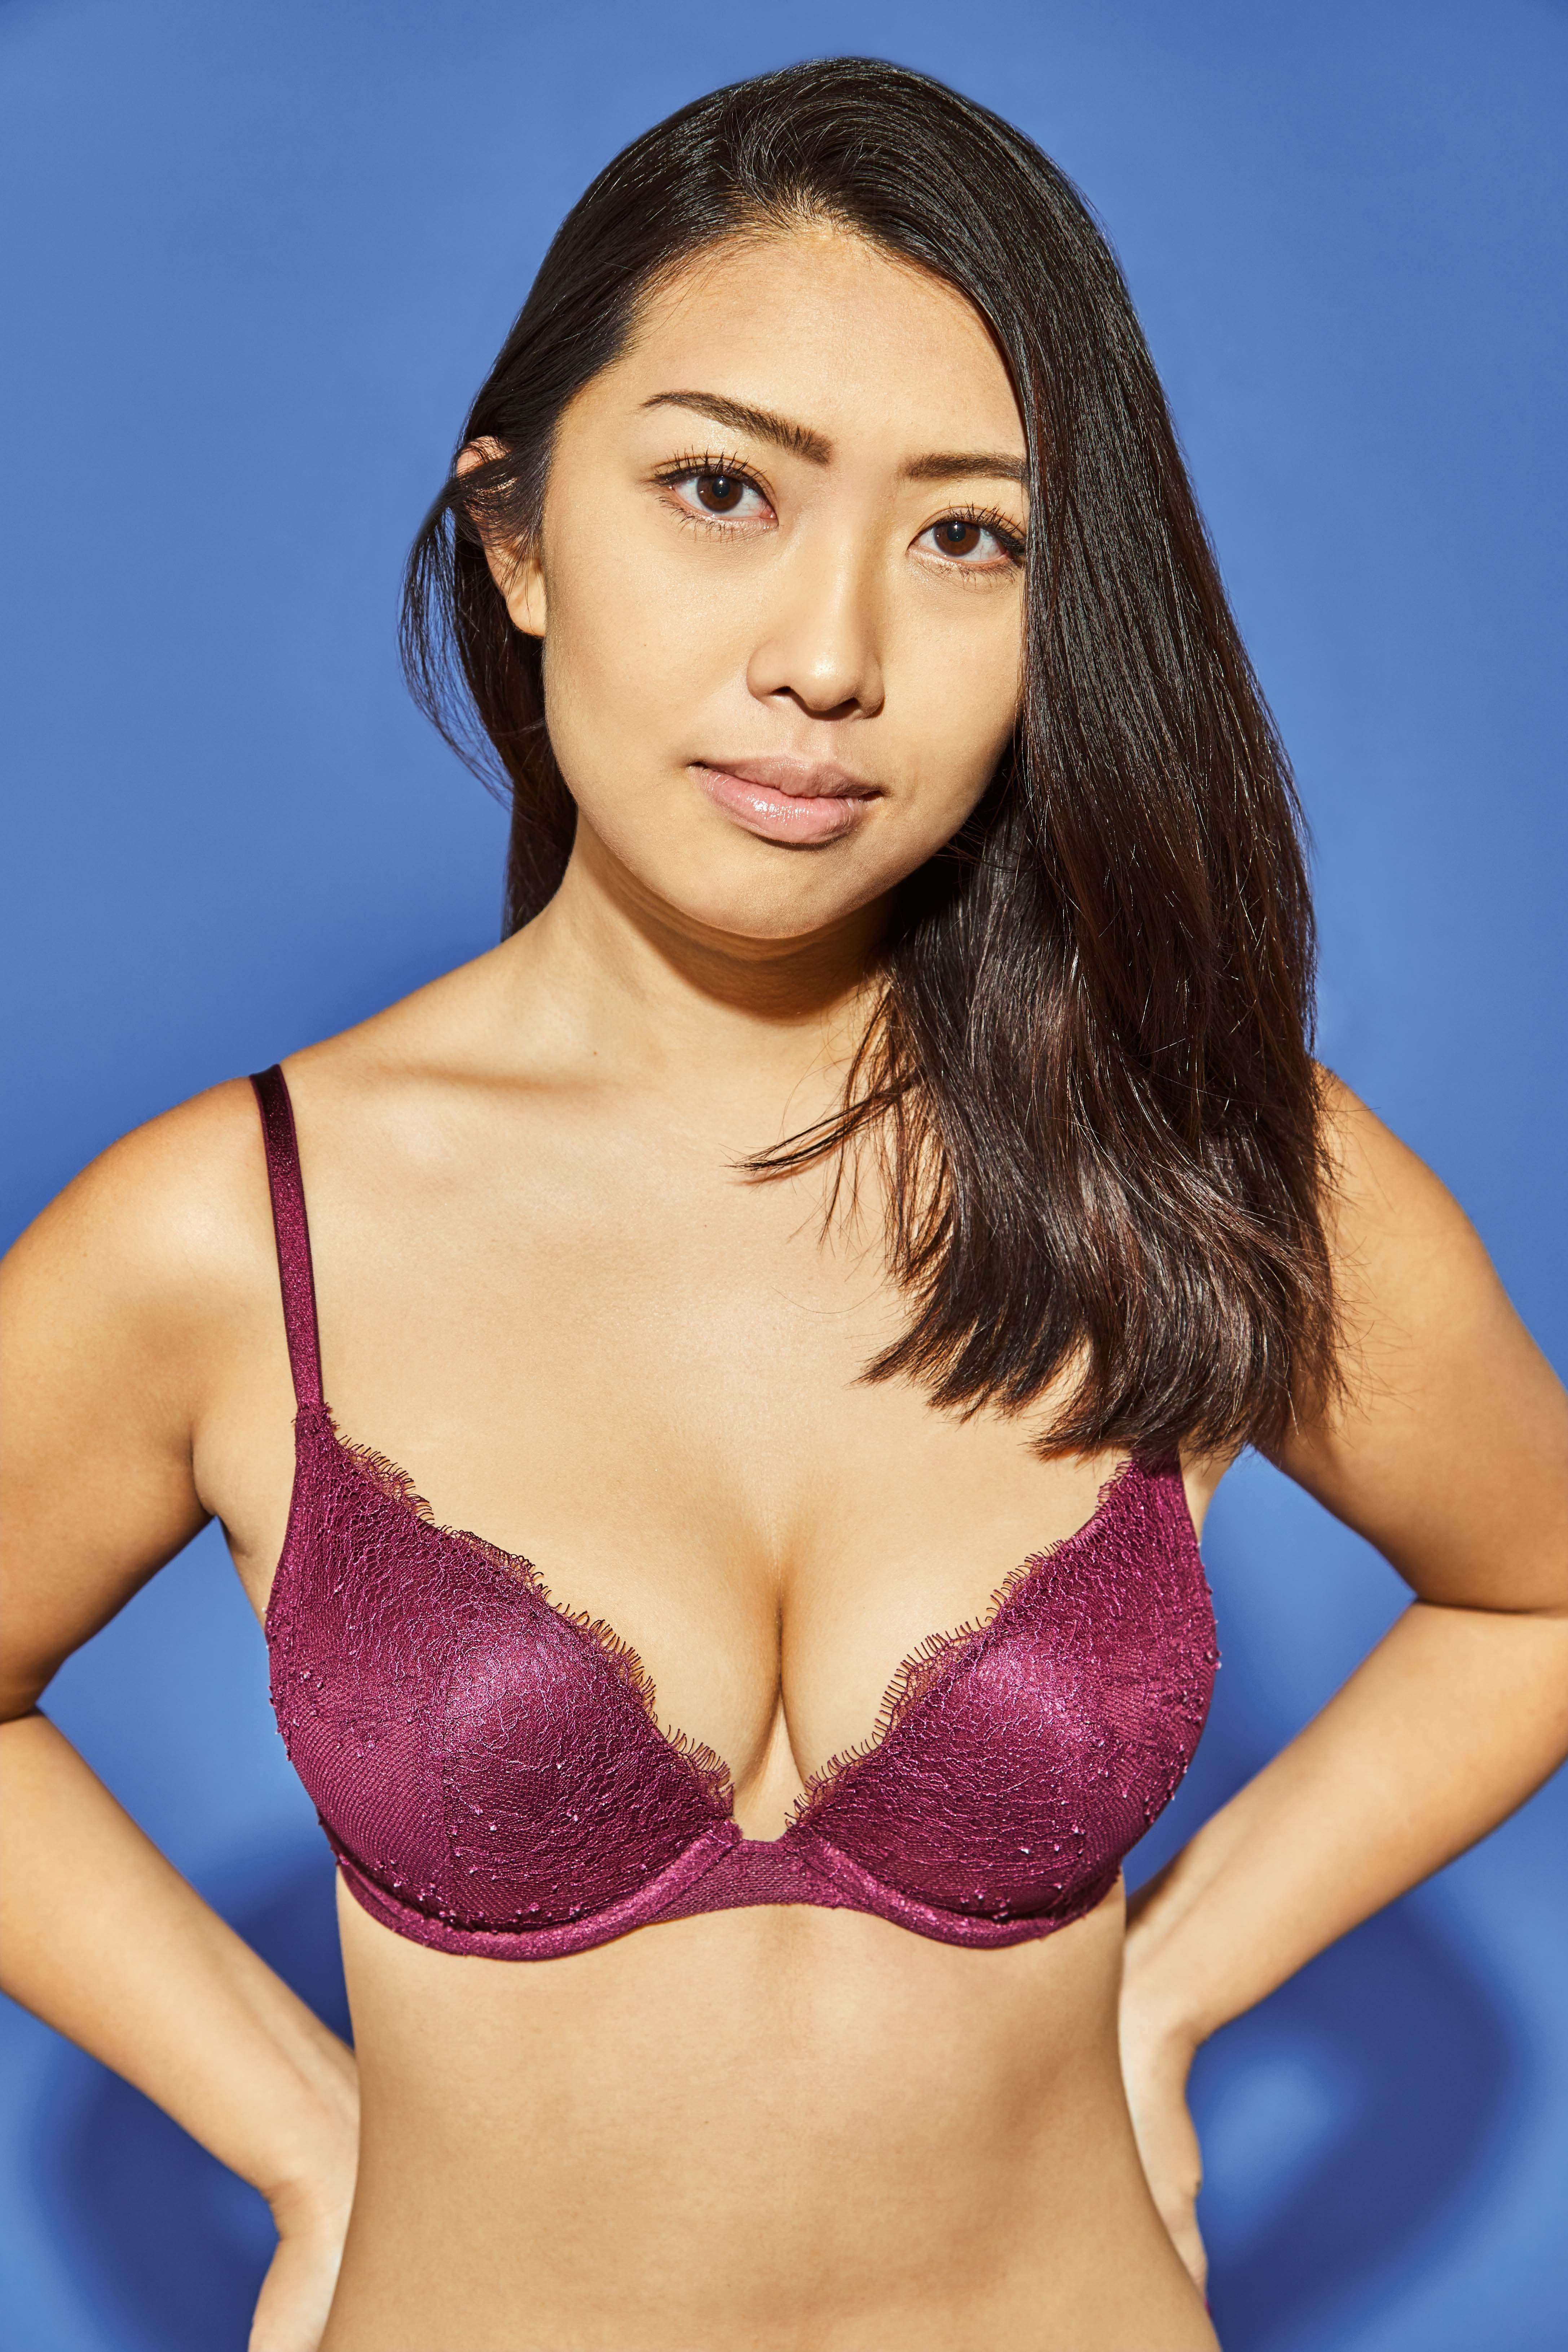 Cleavage Sabrina Man (b. 2000) nude (34 fotos) Erotica, YouTube, swimsuit